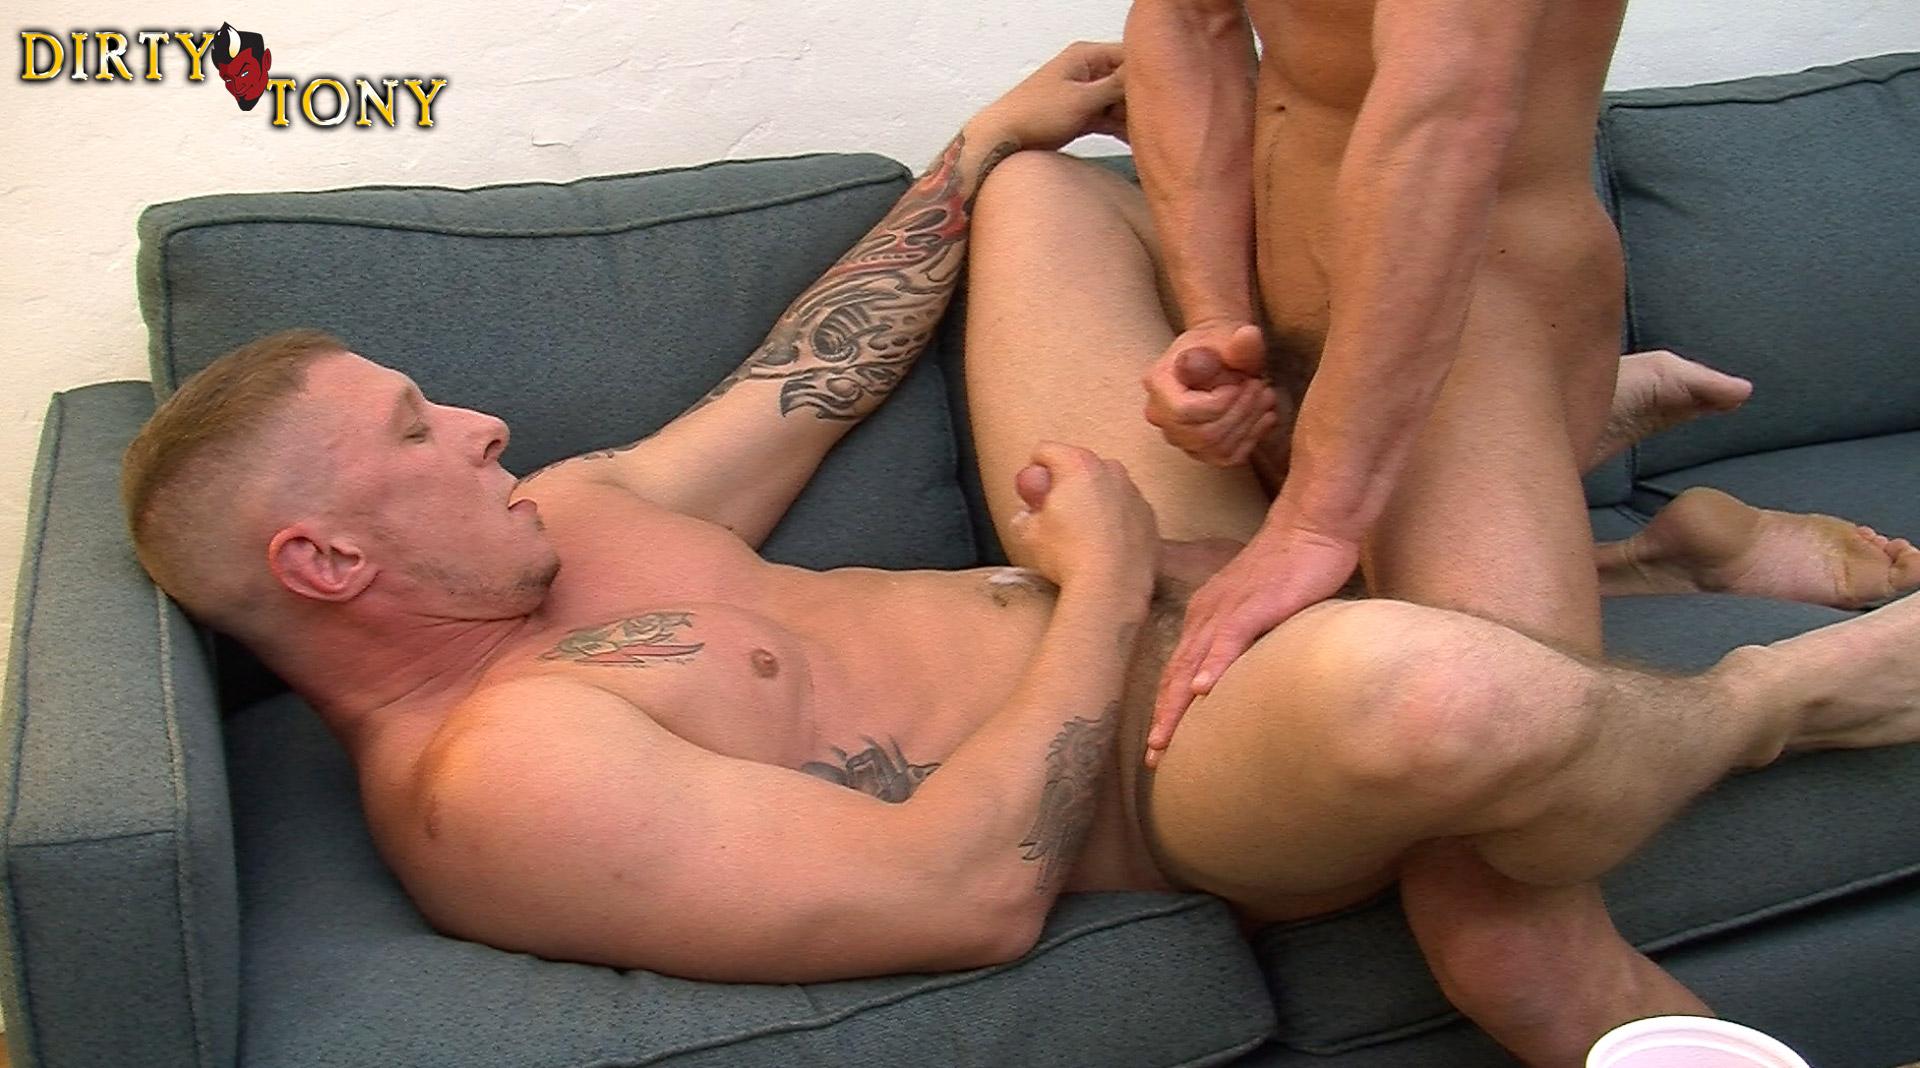 Видео порно геи дрочка